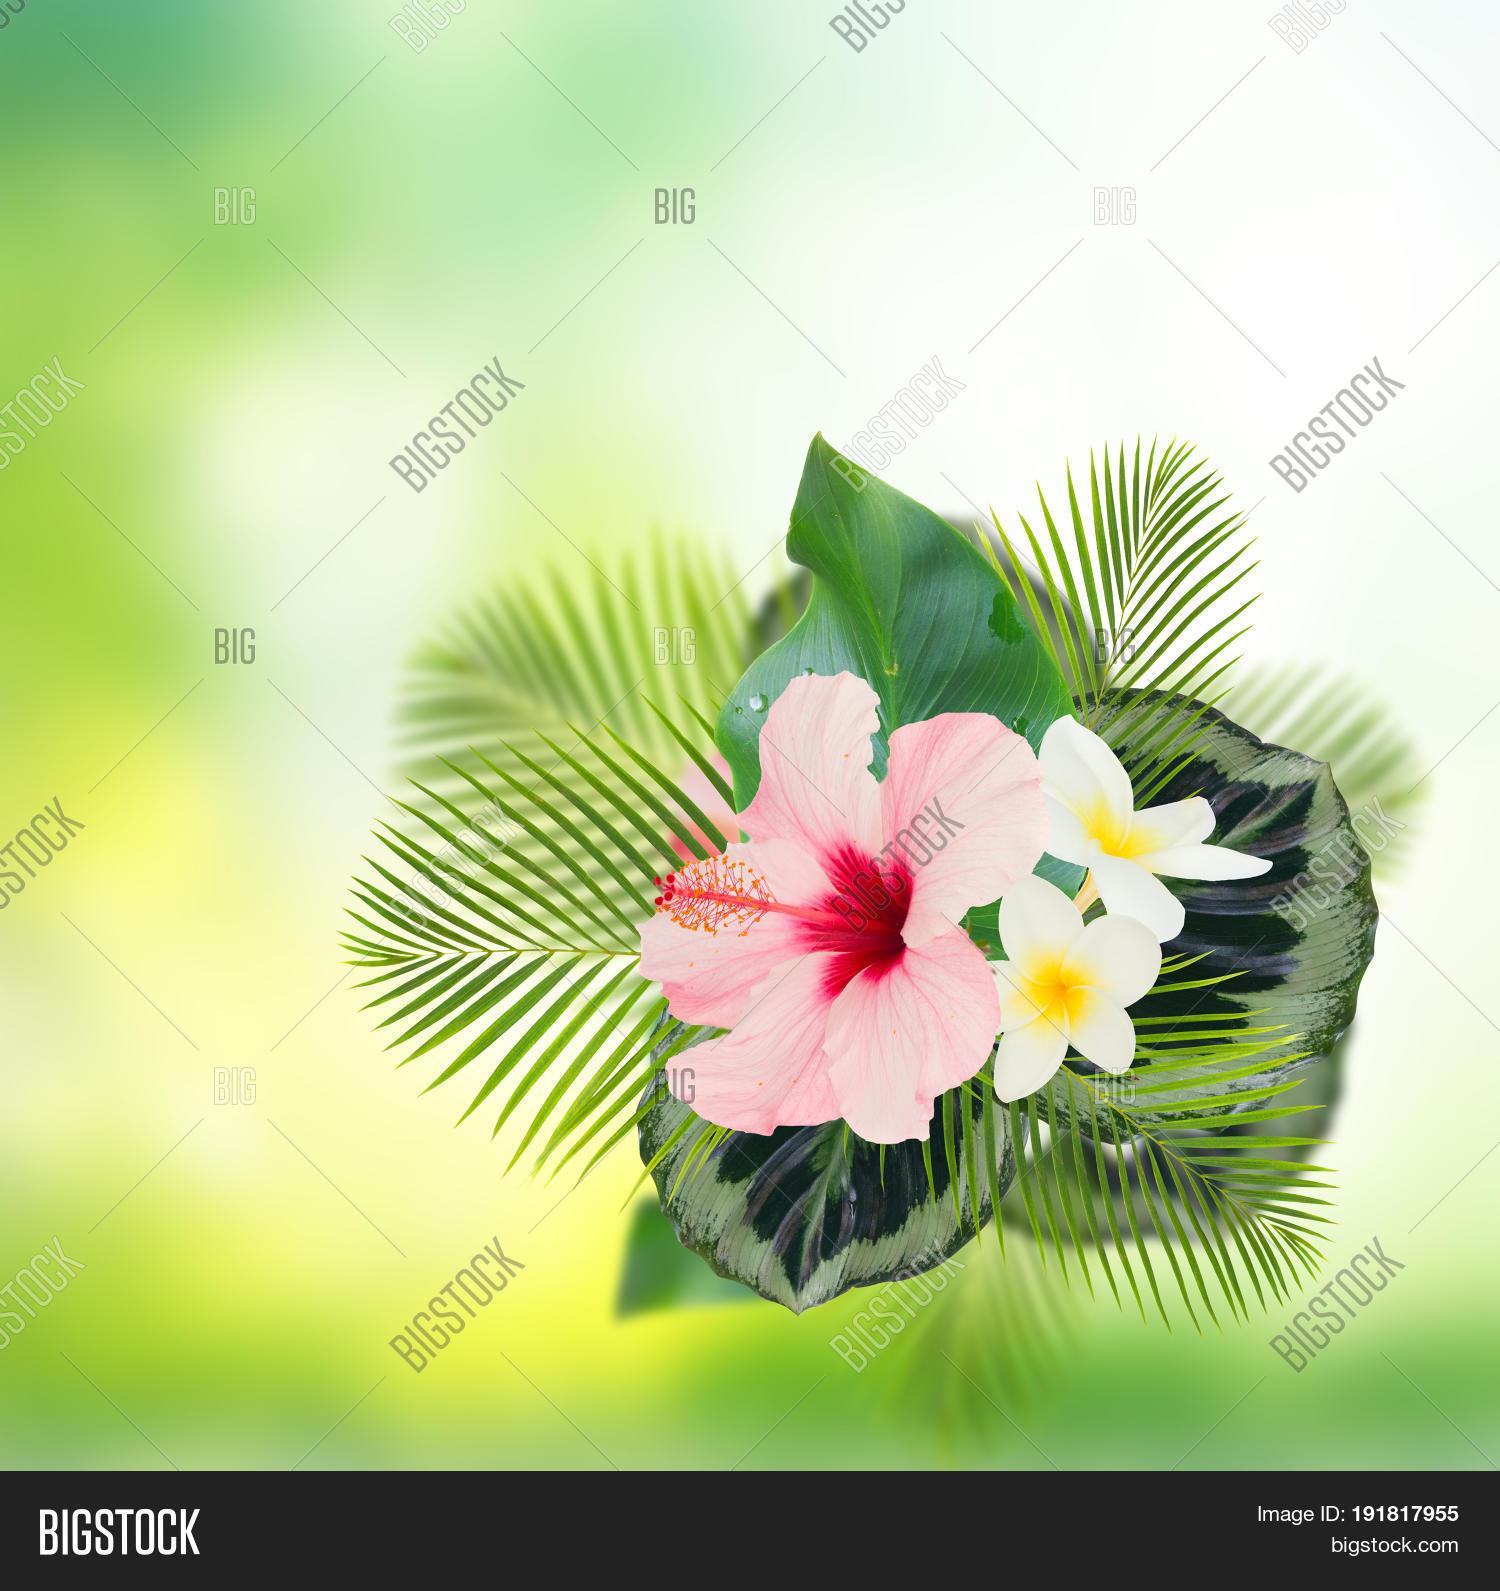 Tropical Fresh Flowers Image Photo Free Trial Bigstock